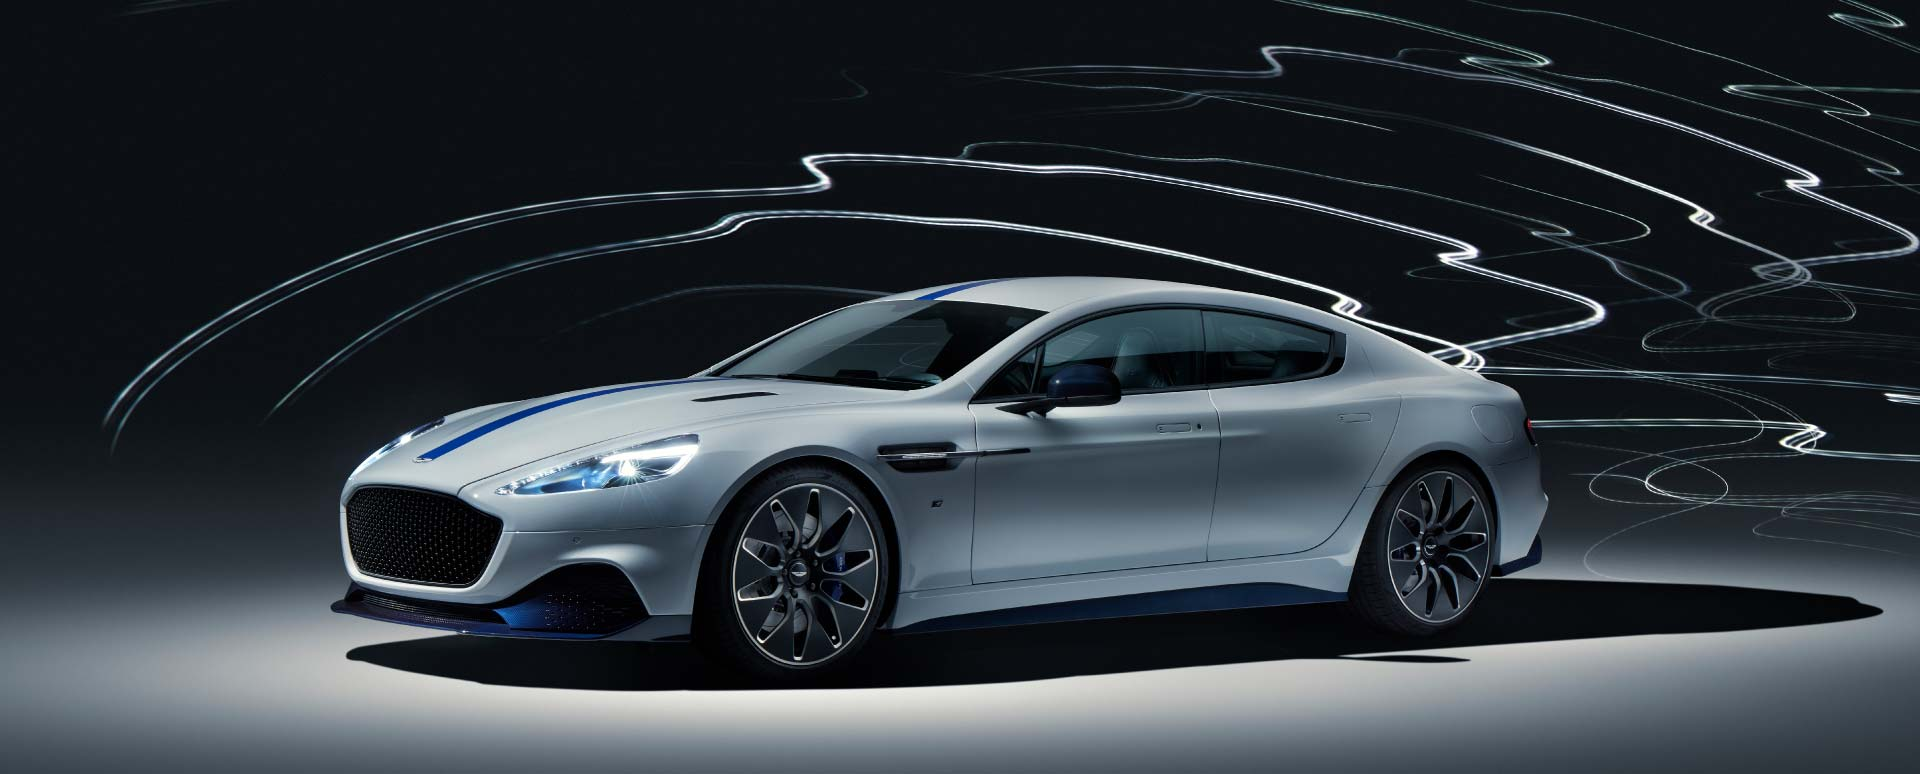 Aston Martin Electric